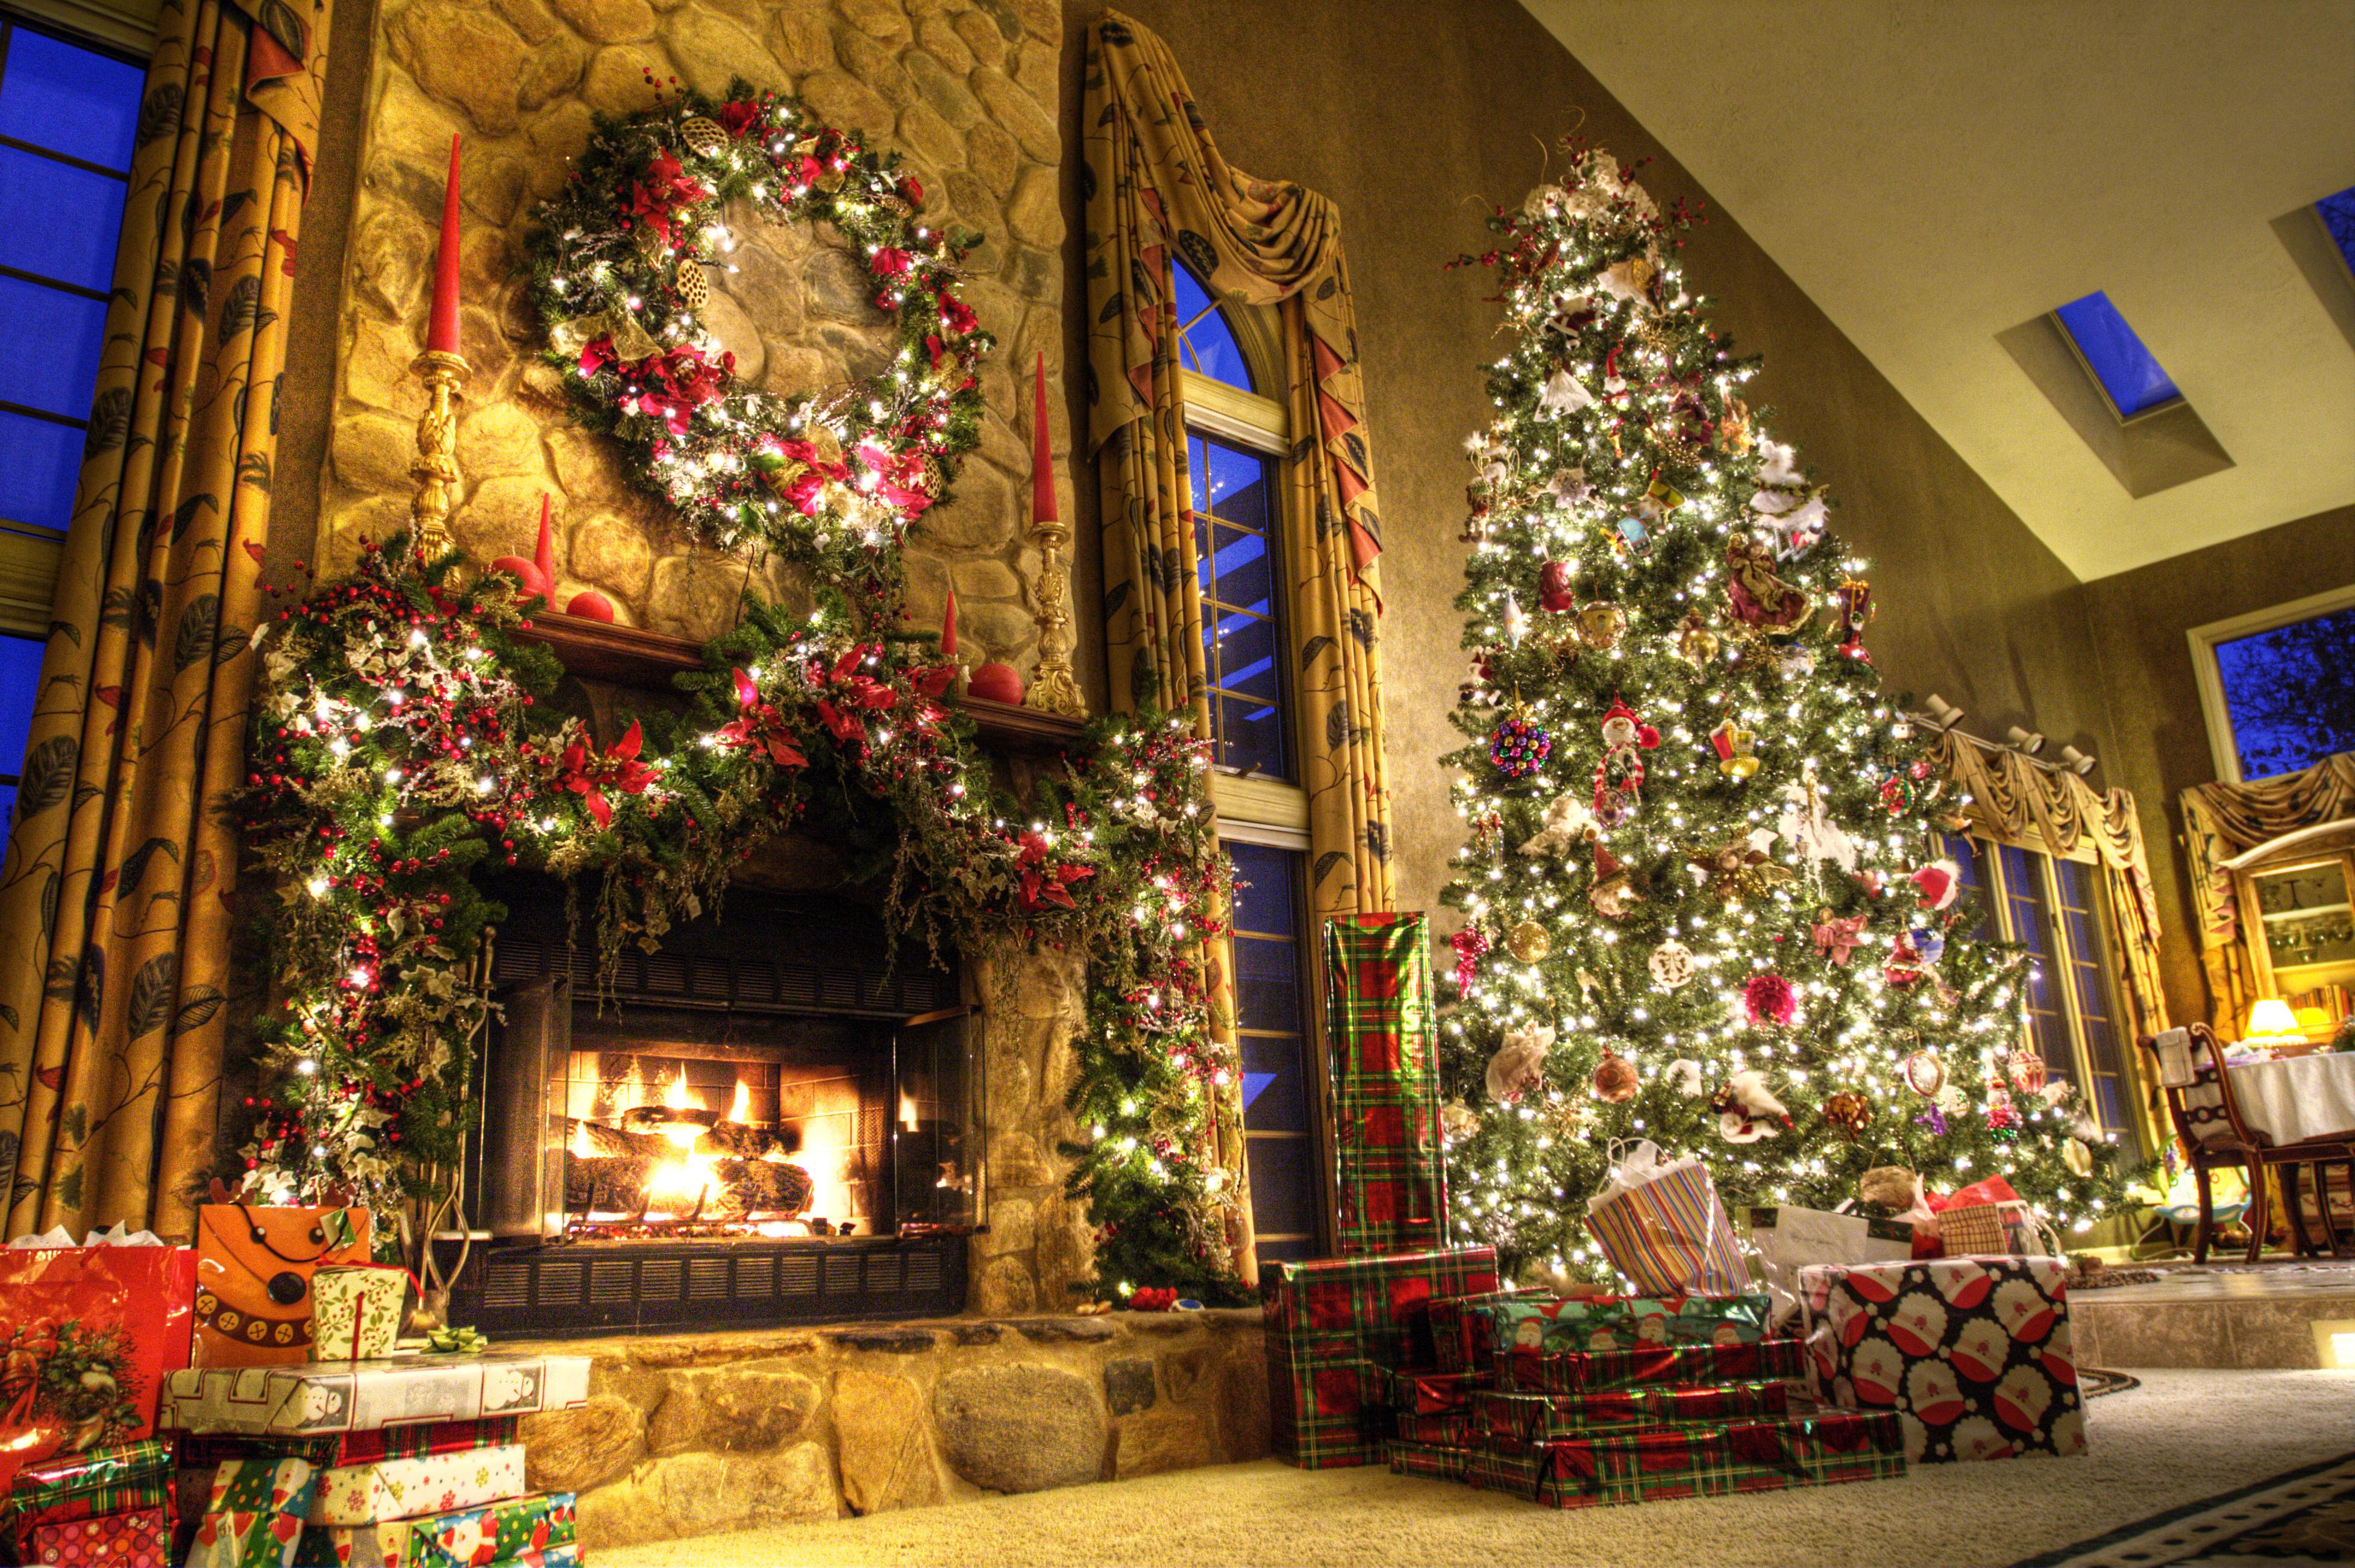 Christmas Tree By Fireplace  Toys Lights Christmas tree fireplace room Desktop